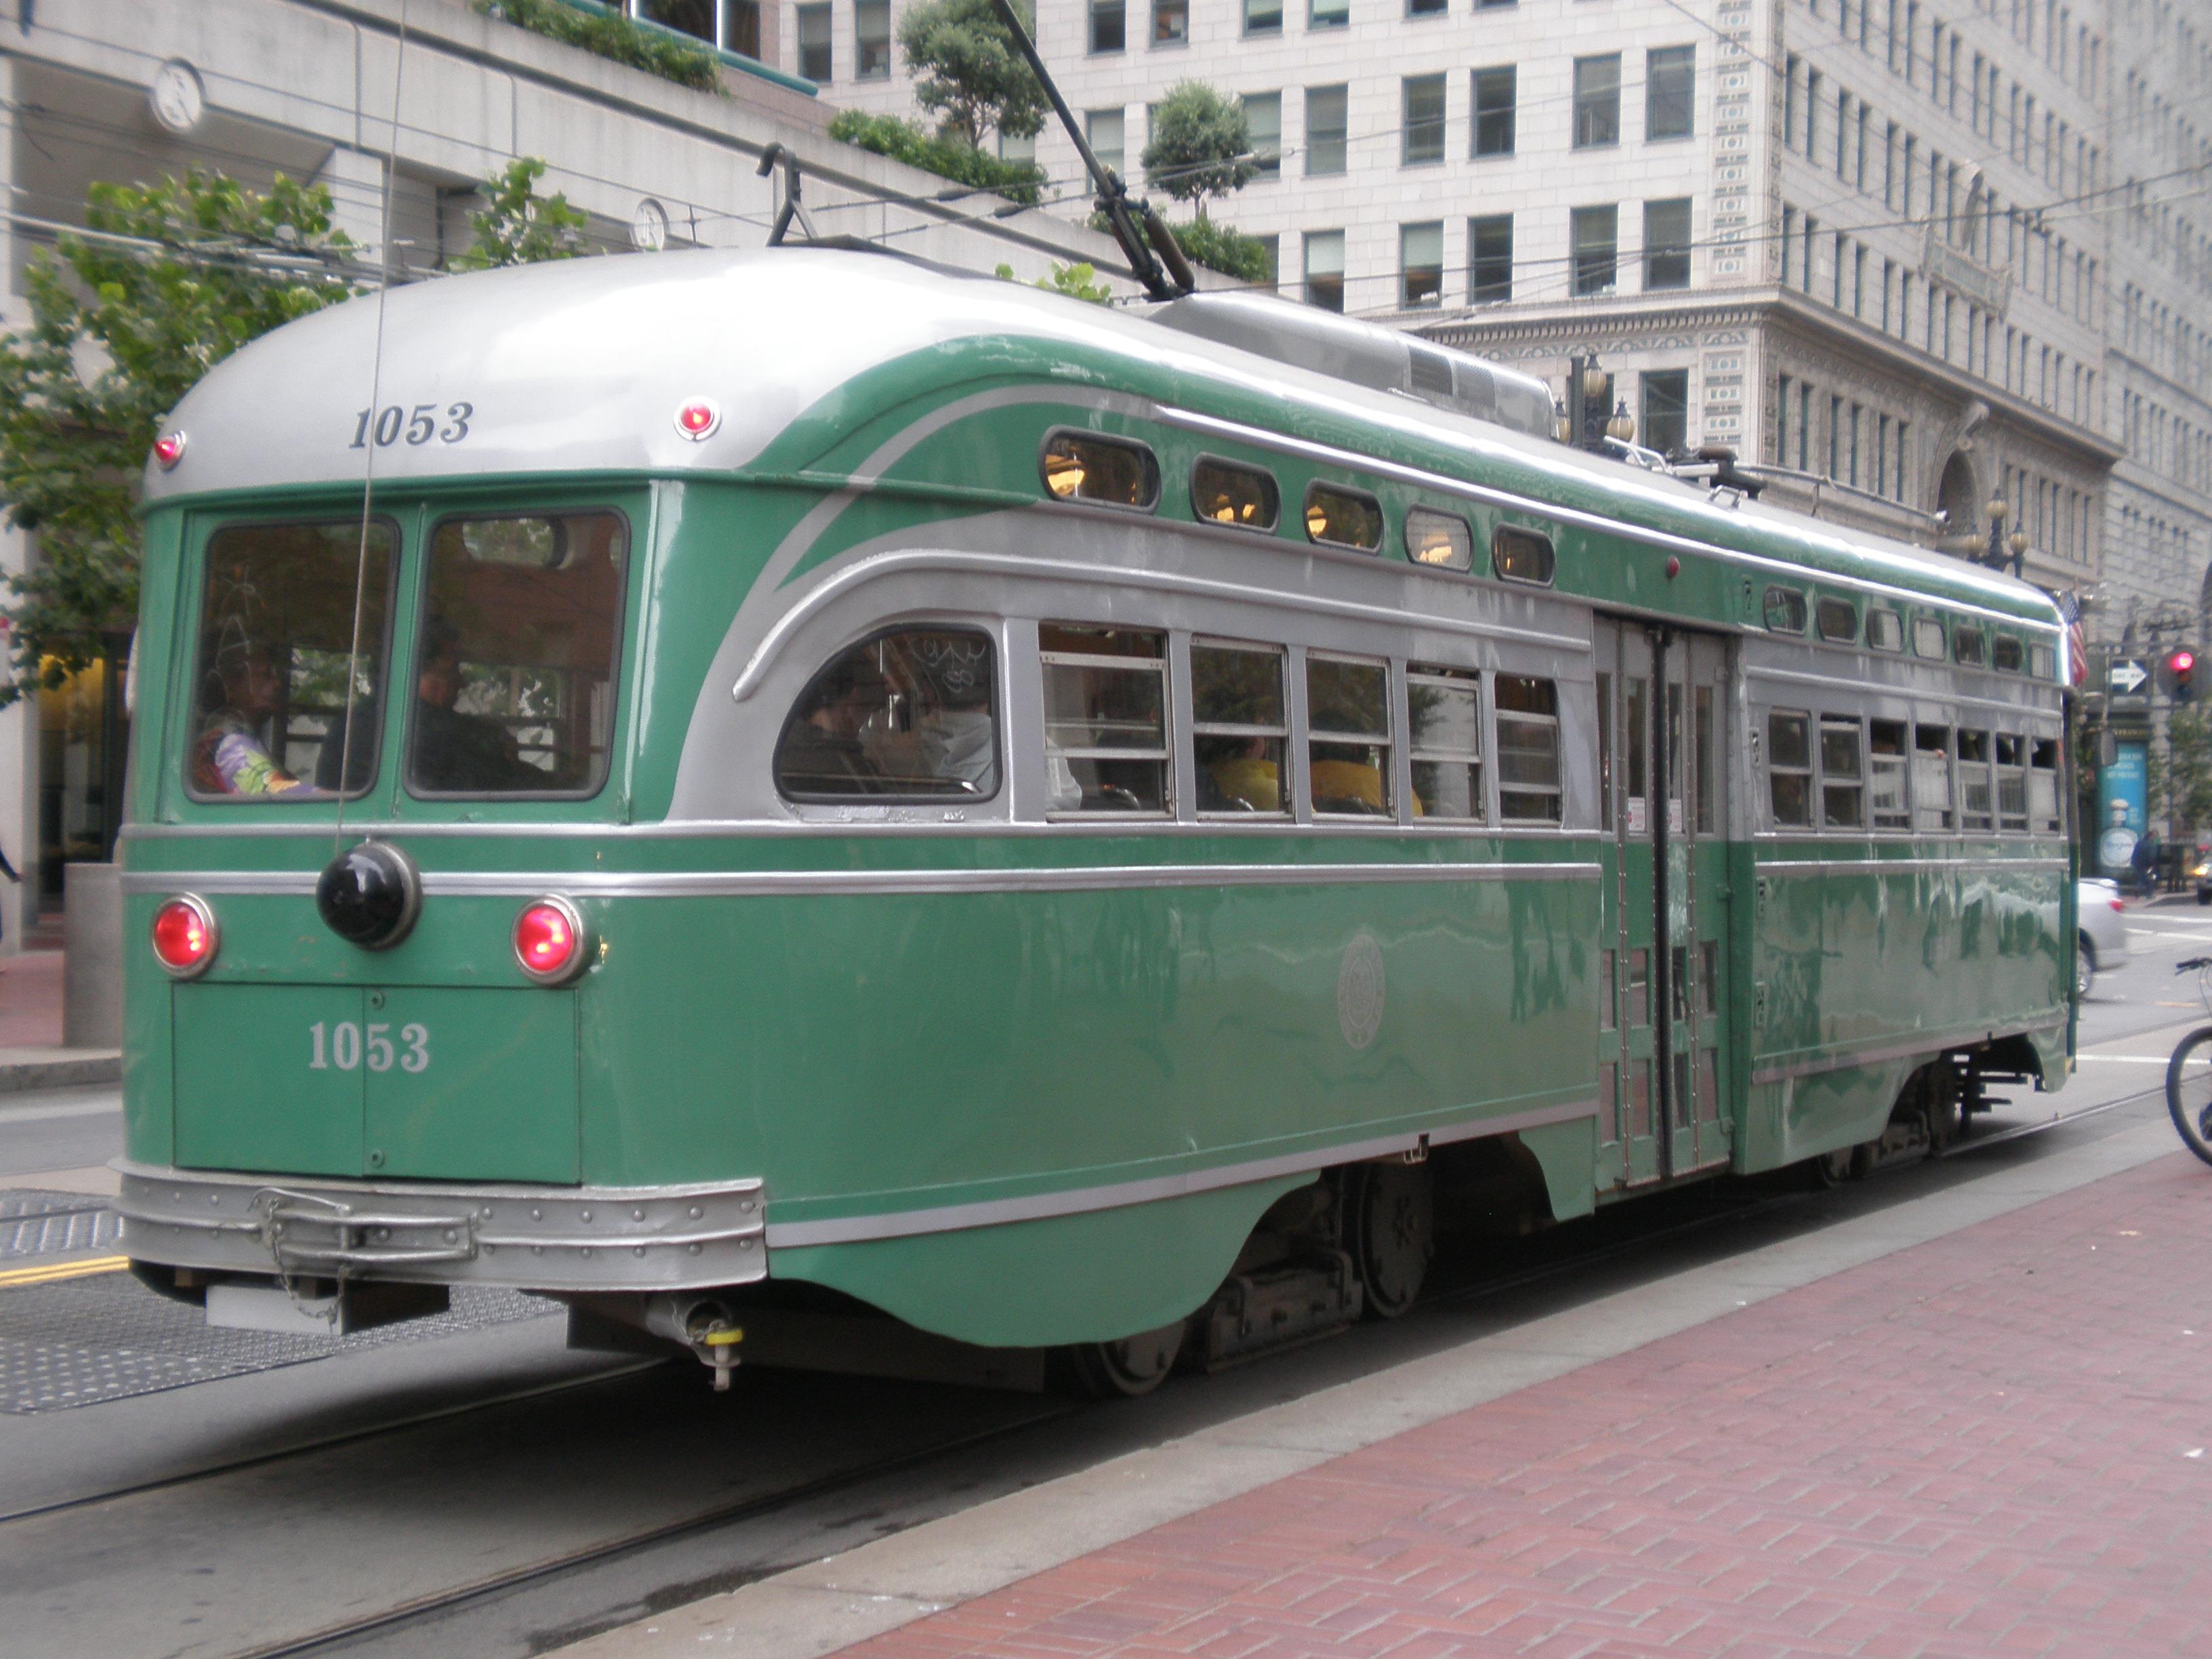 File:Muni PCC streetcar 1053 side.JPG